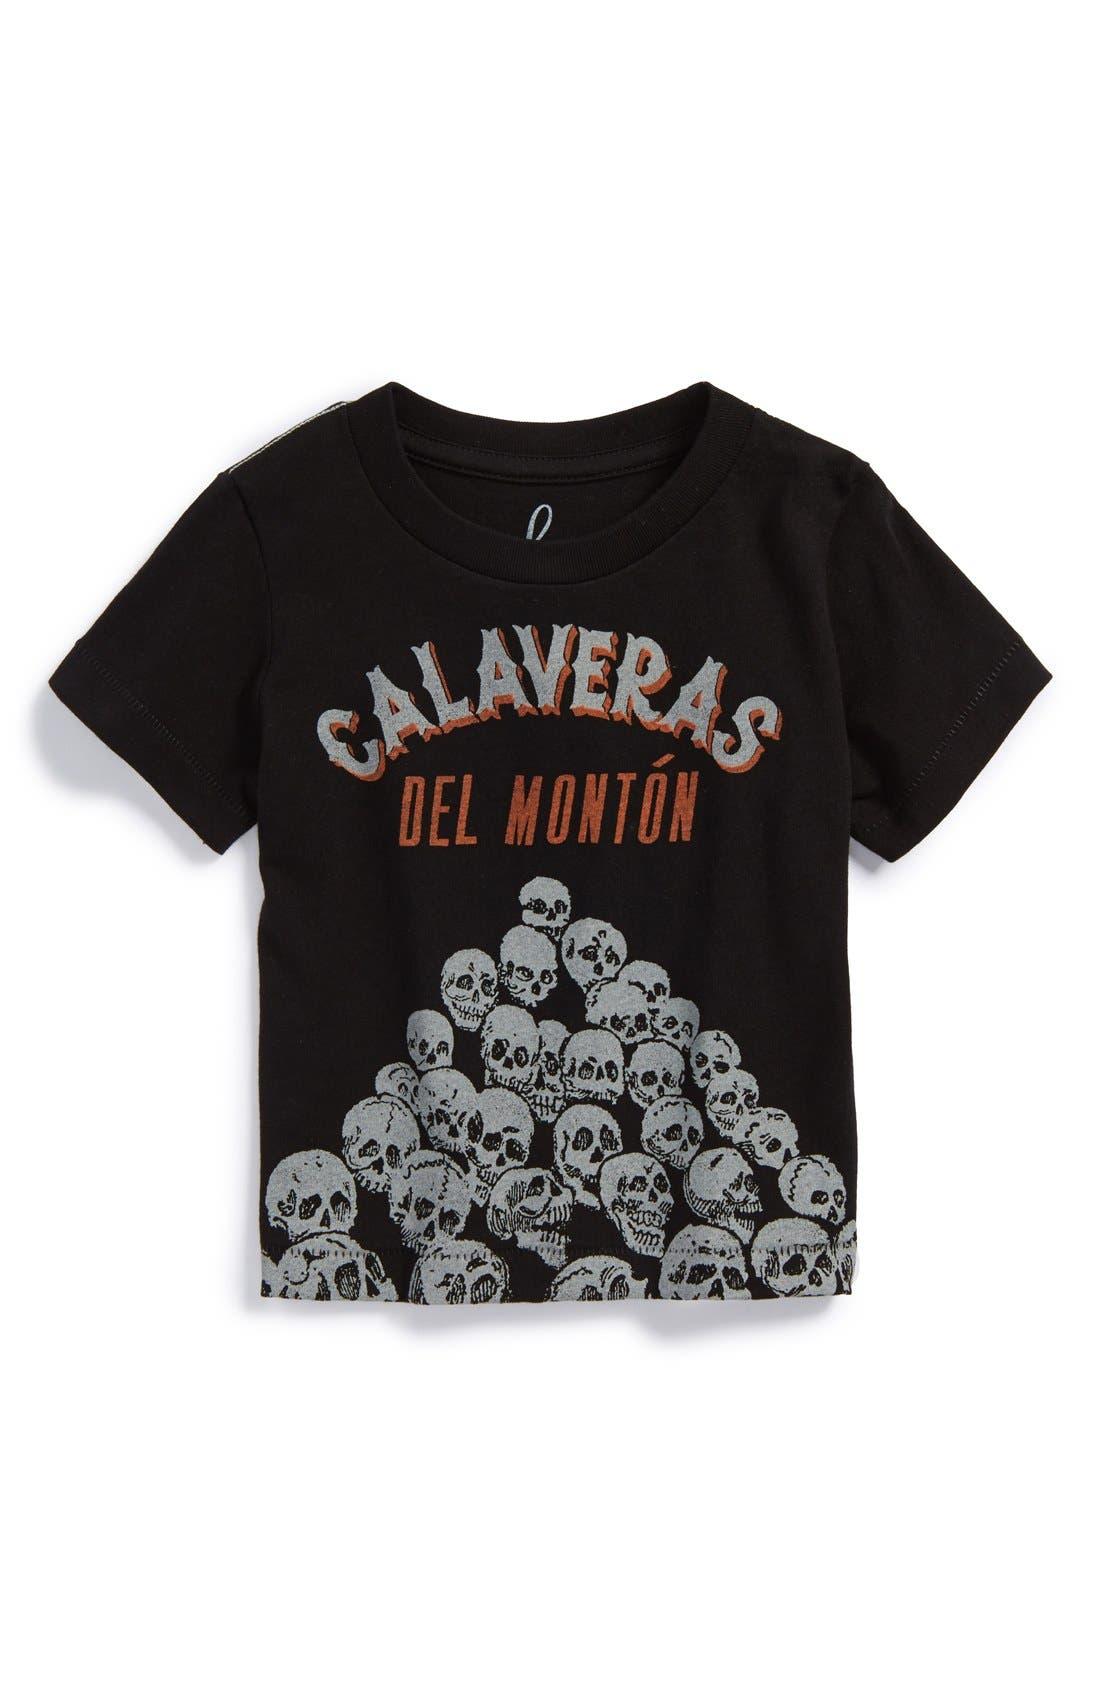 Peek 'Calavera del Montón' T-Shirt,                             Main thumbnail 1, color,                             002